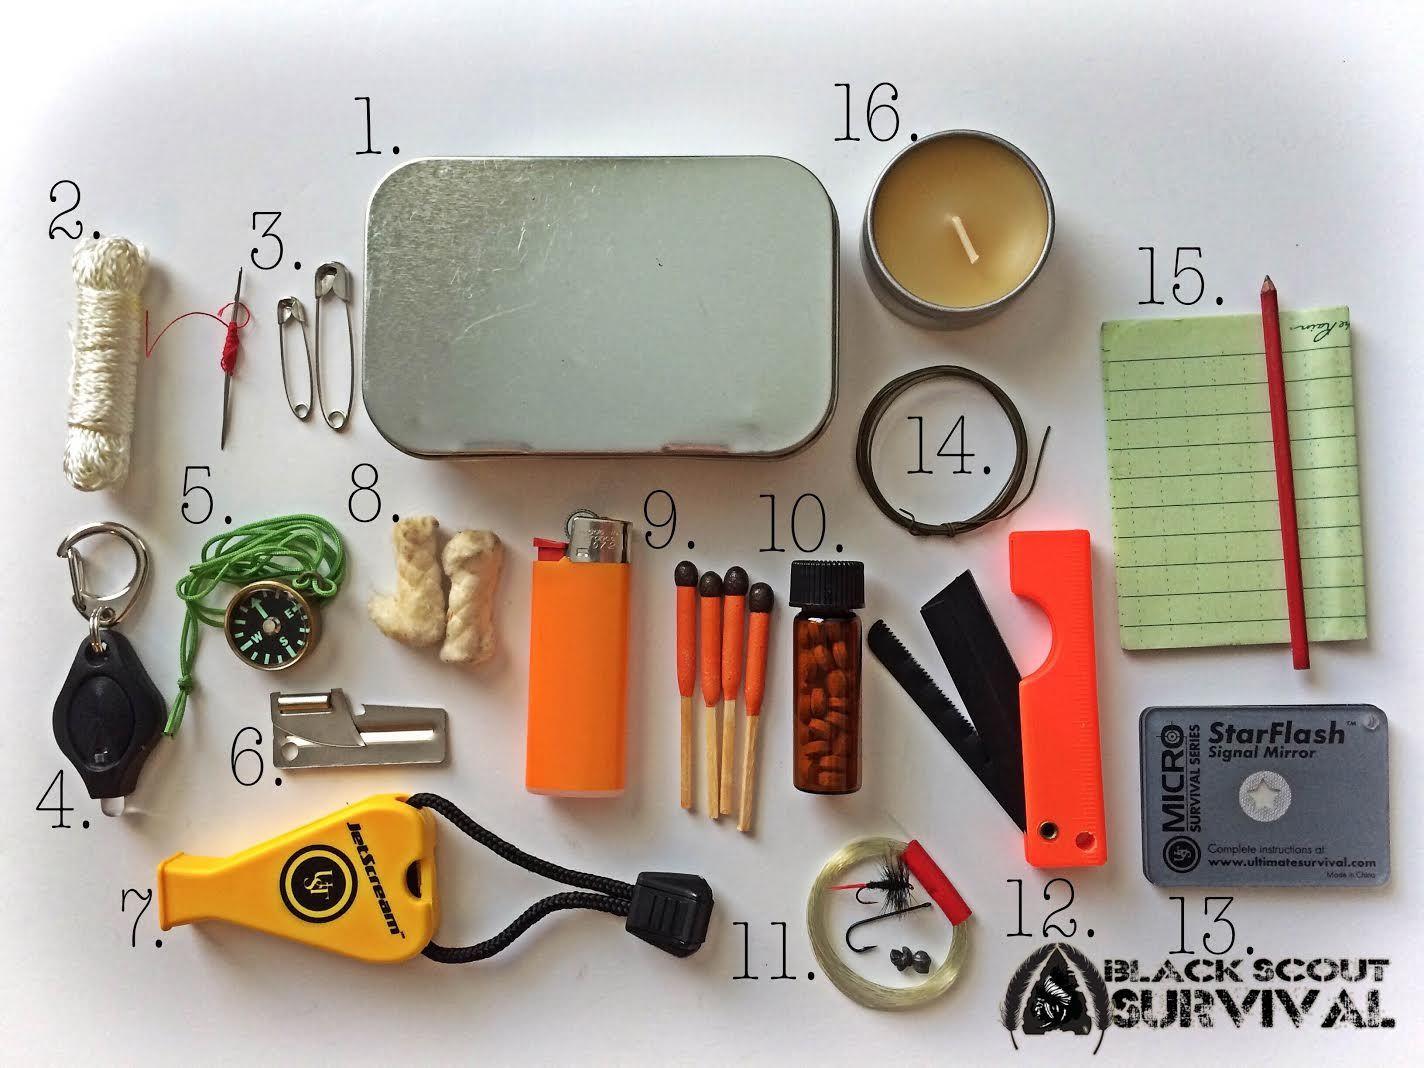 Black Scout Survival How To Build A Survival Tin